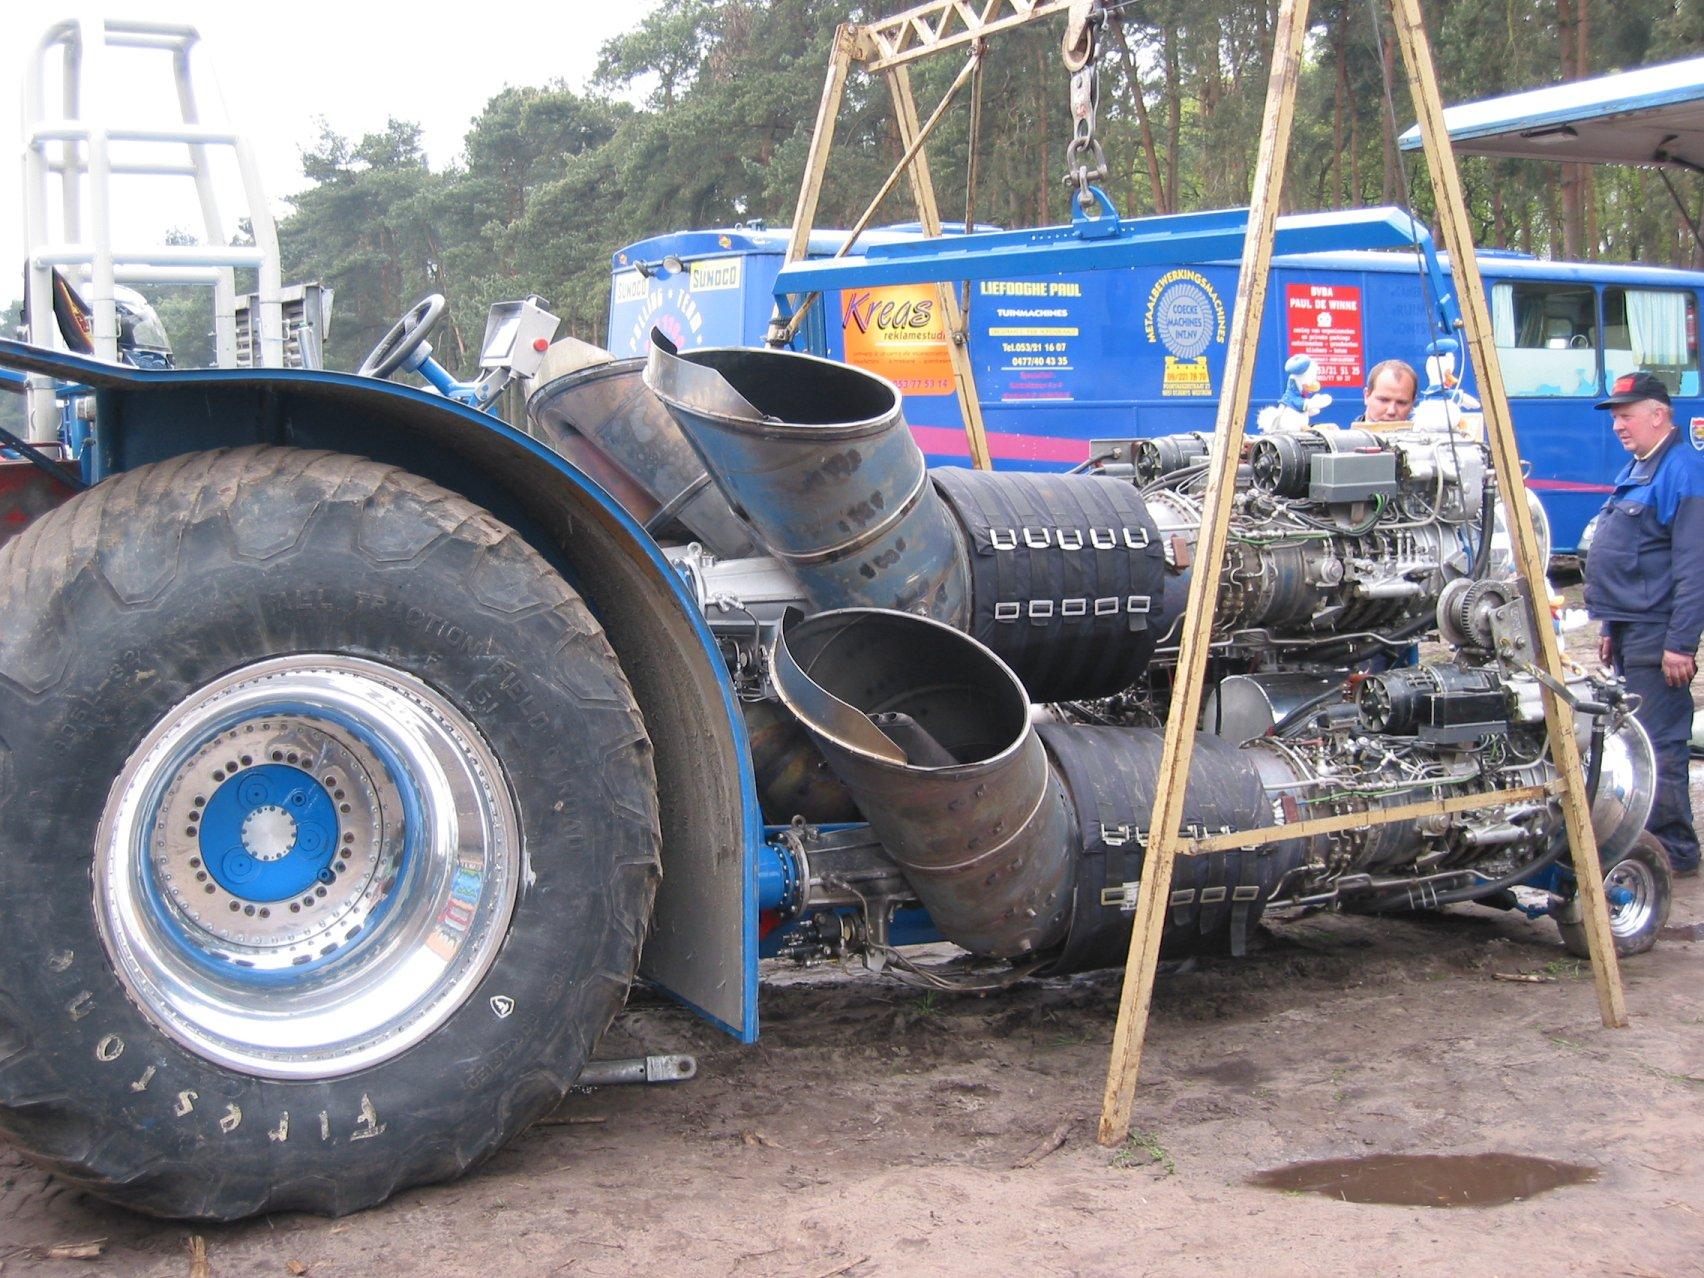 Tractor Pull Pics